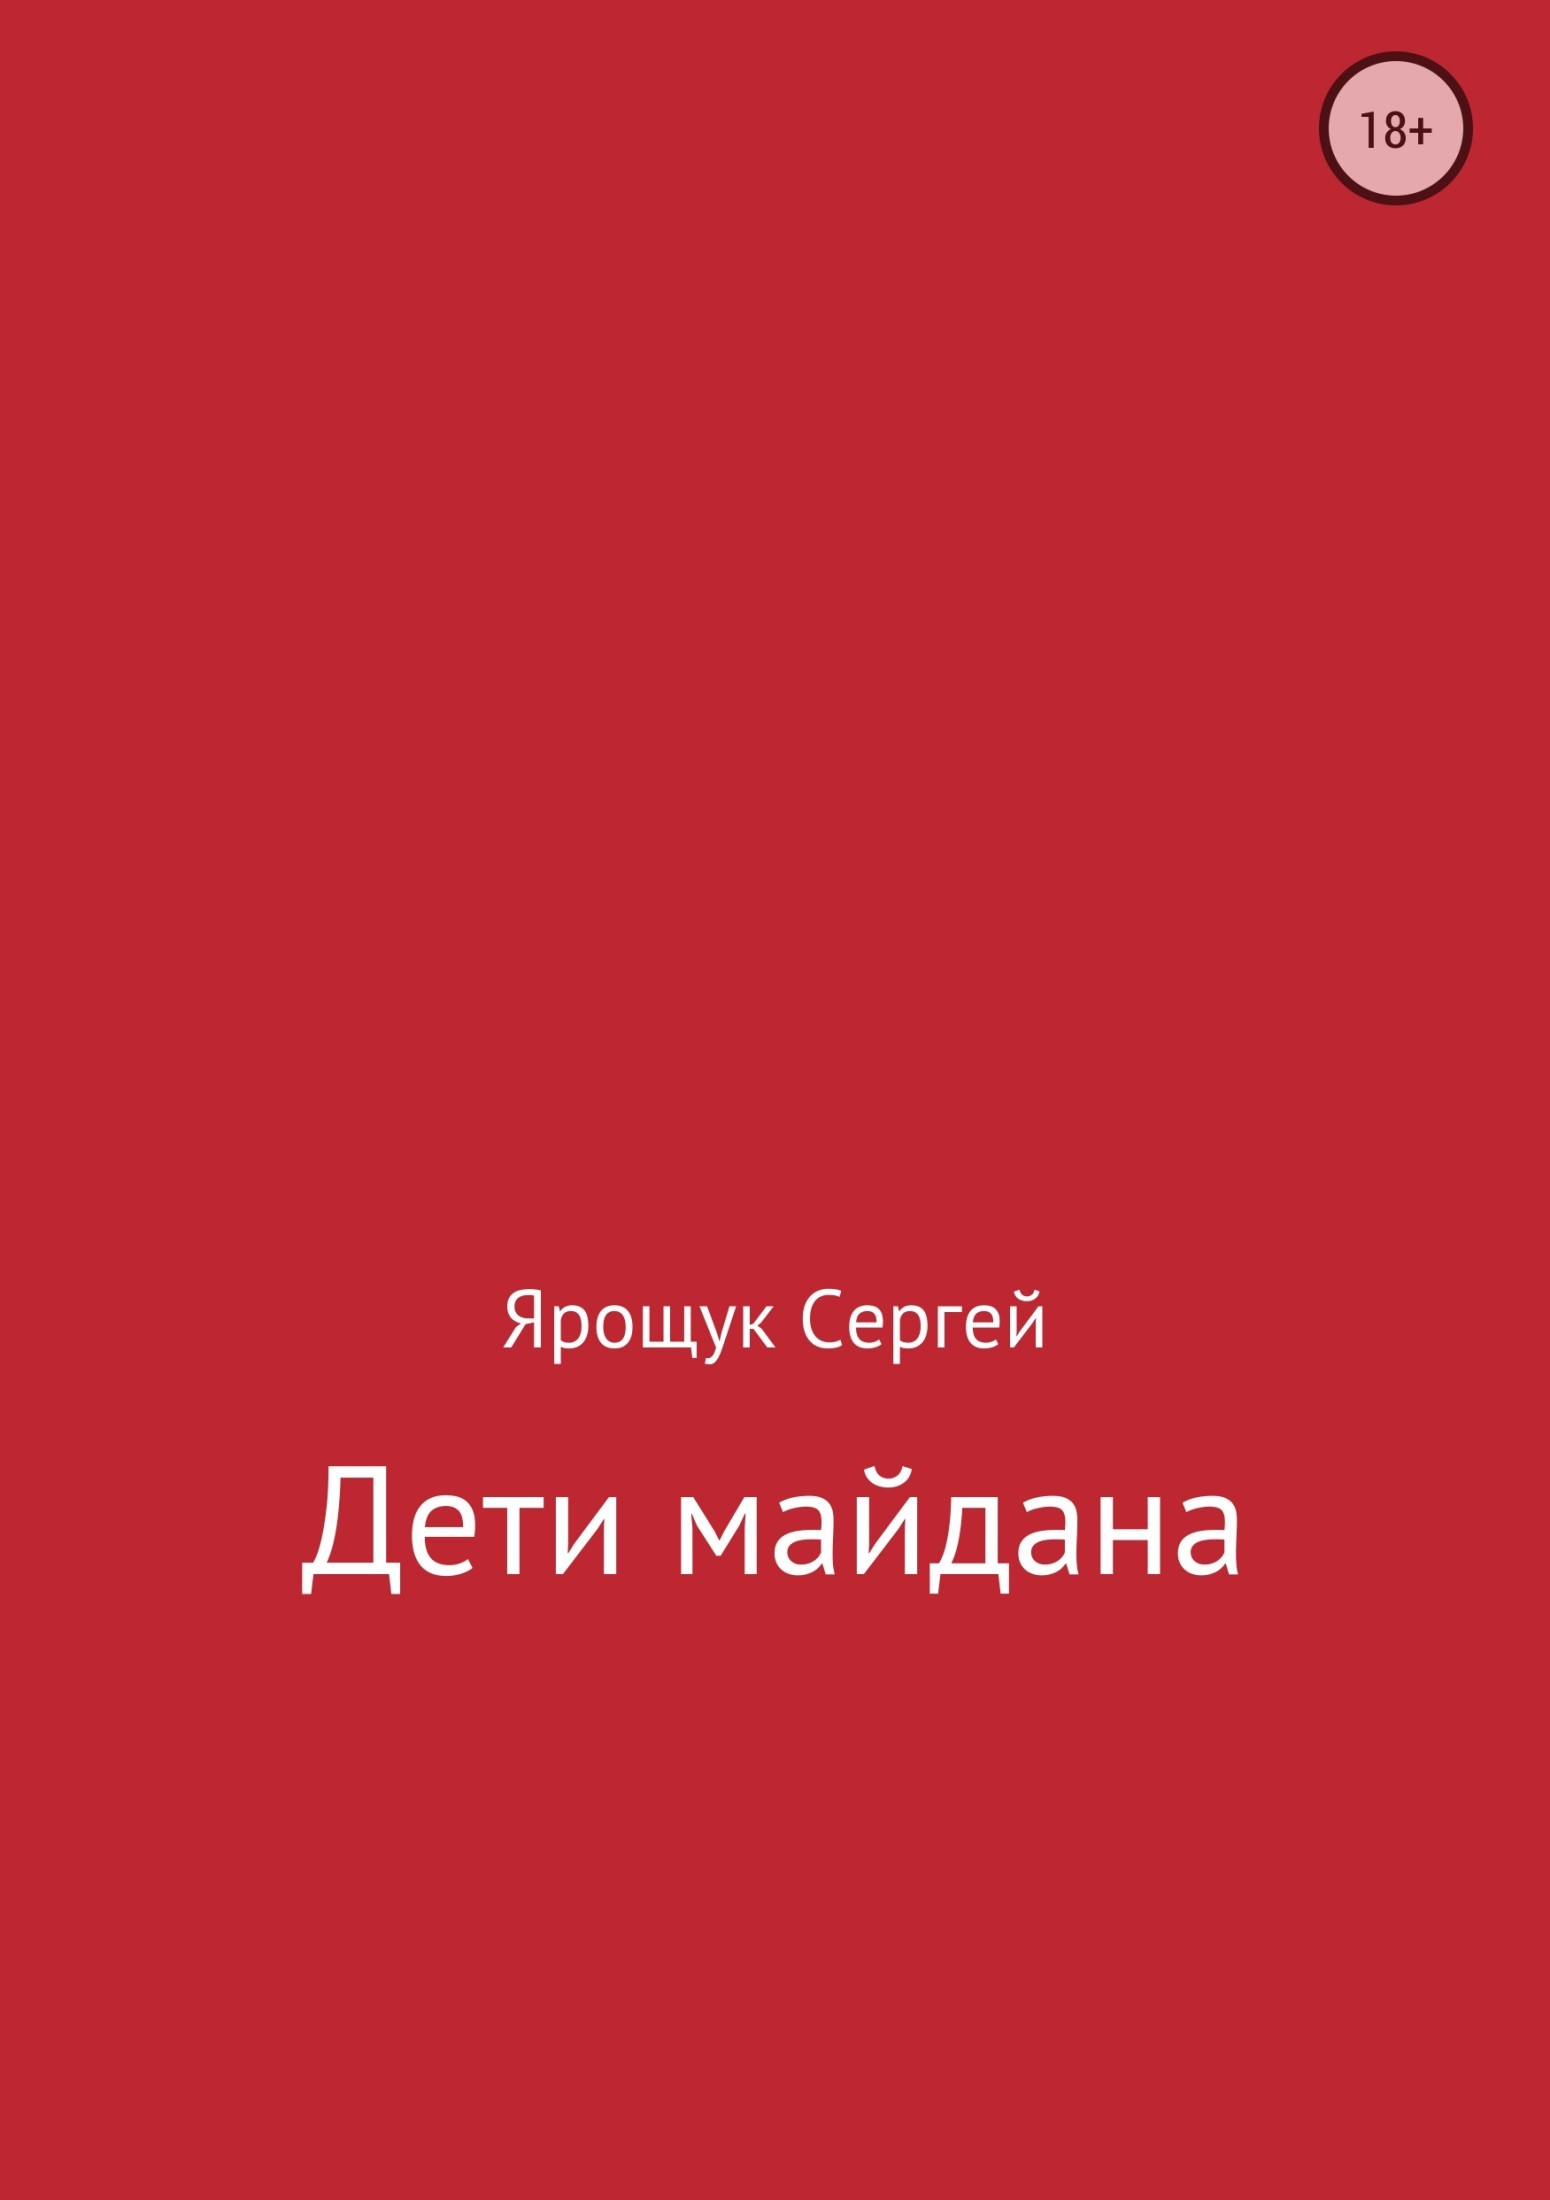 Сергей Ярощук - Дети майдана